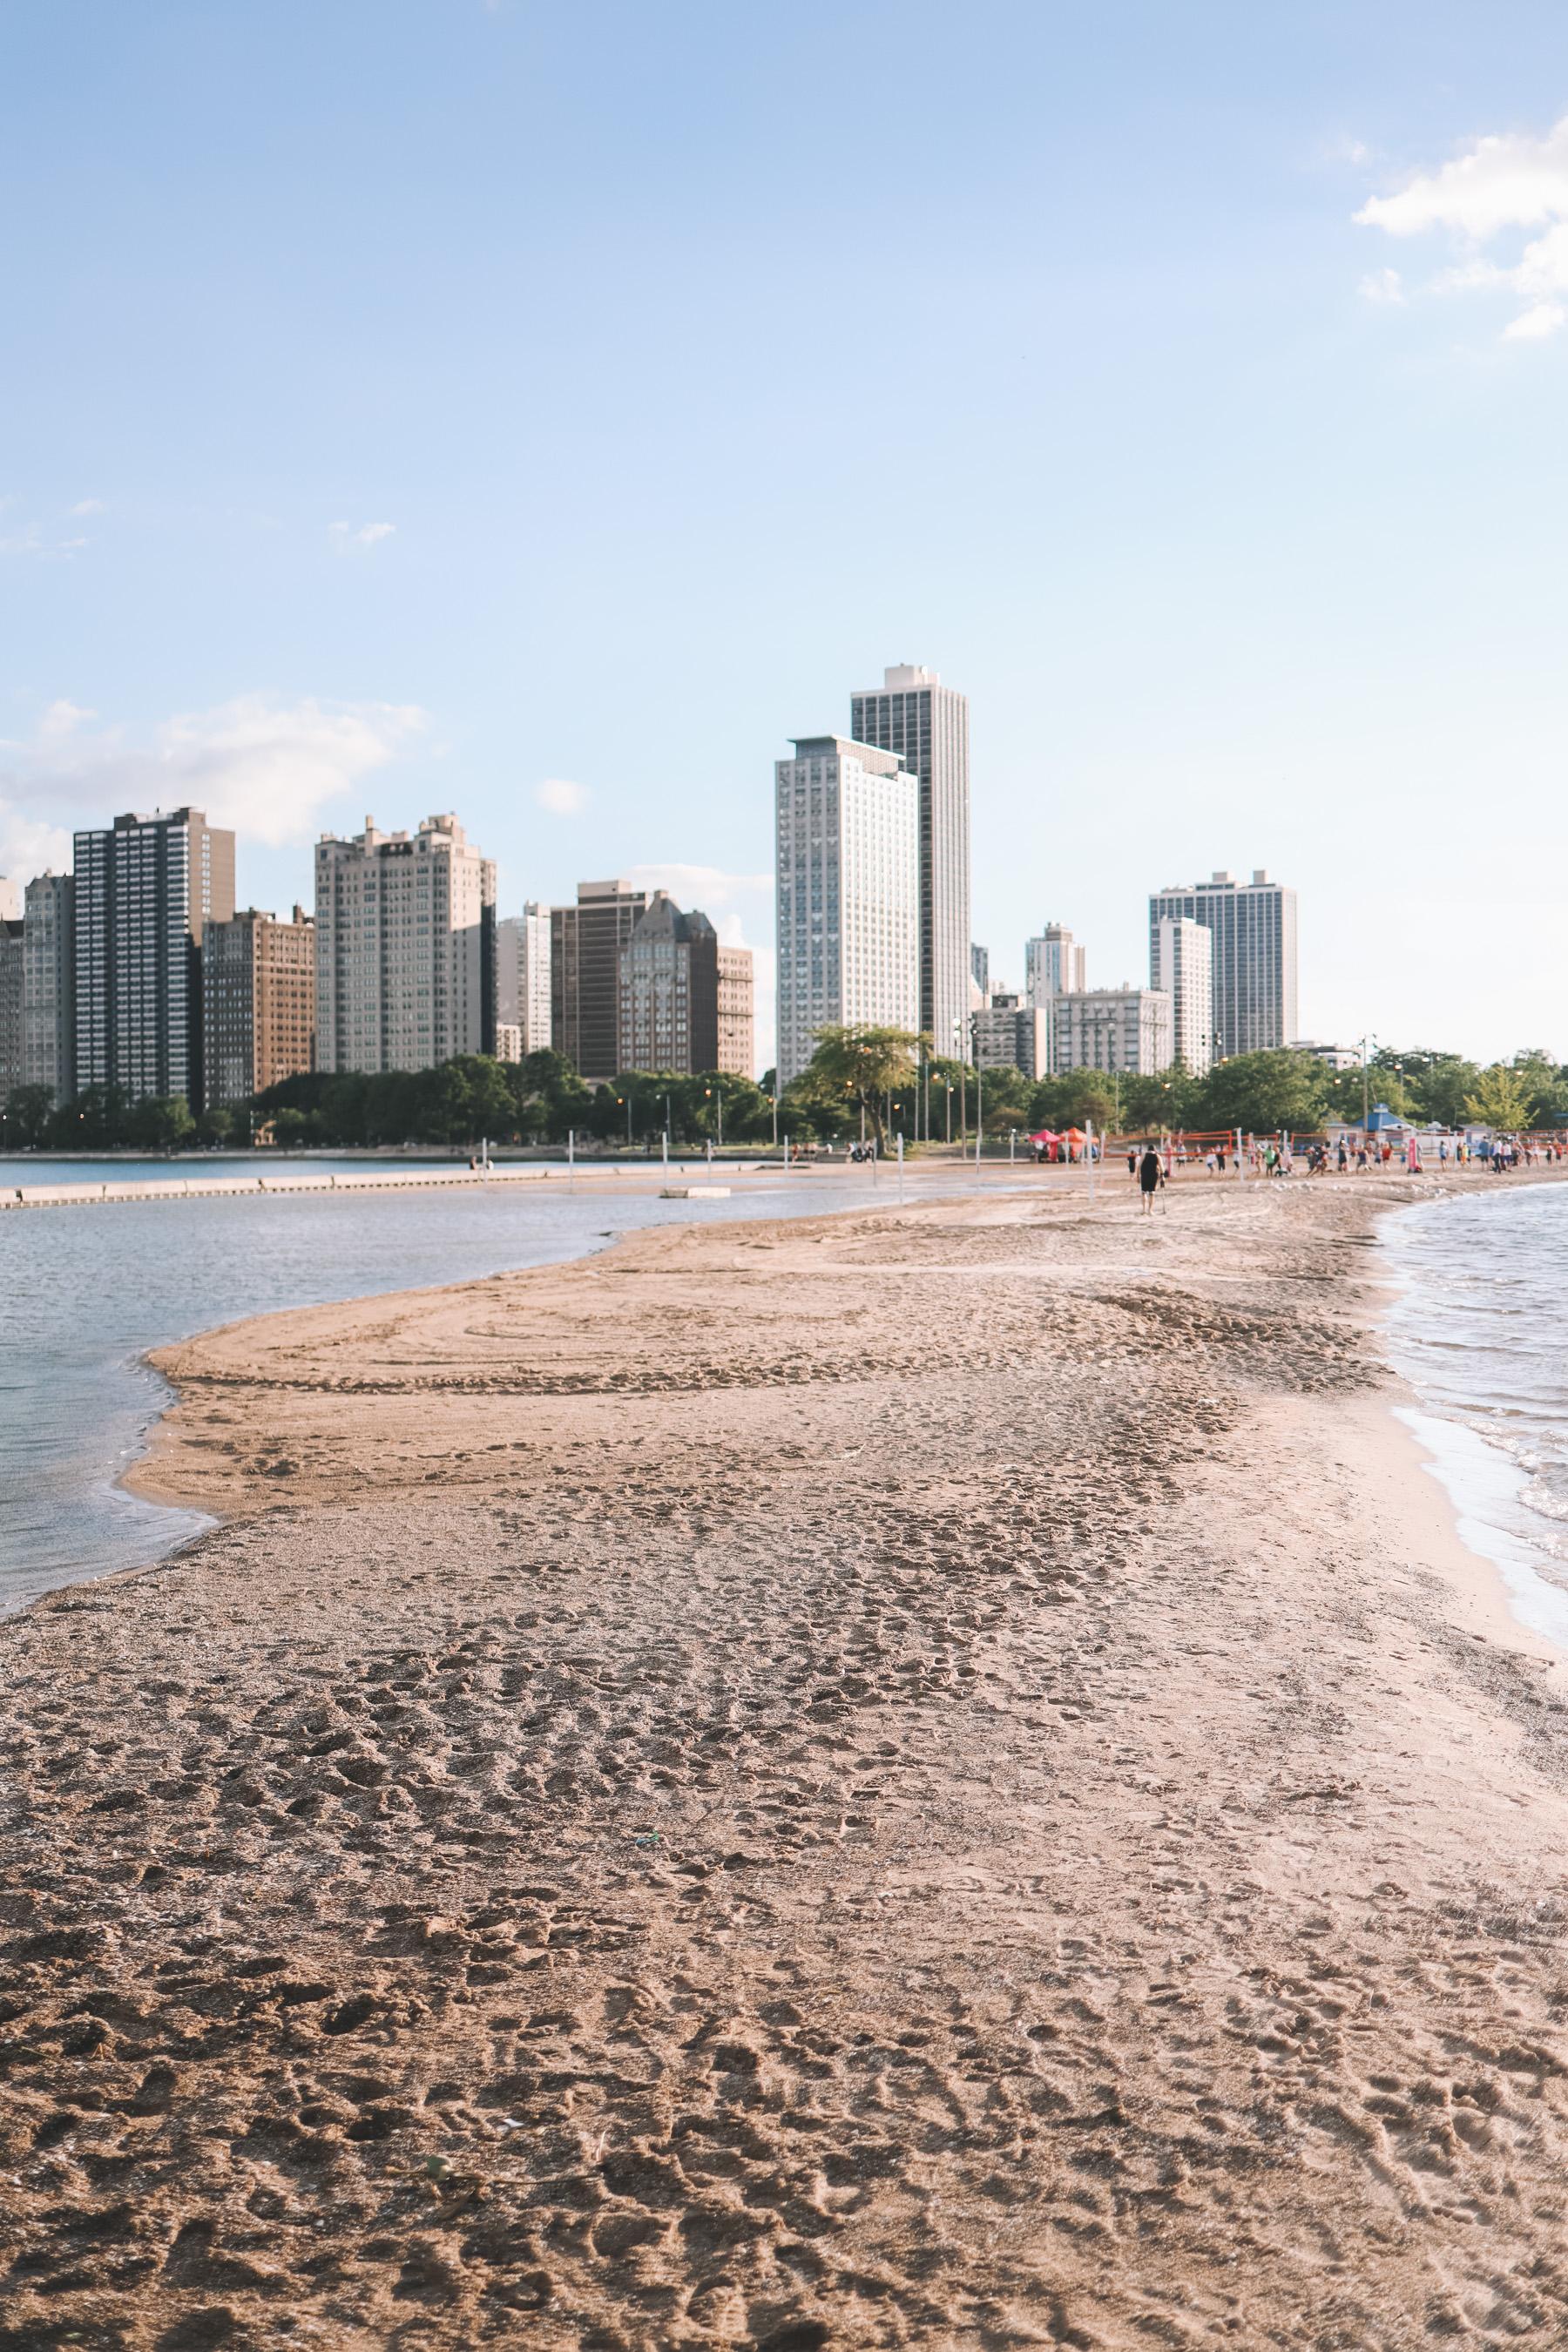 North Avenue Beach in Chicago